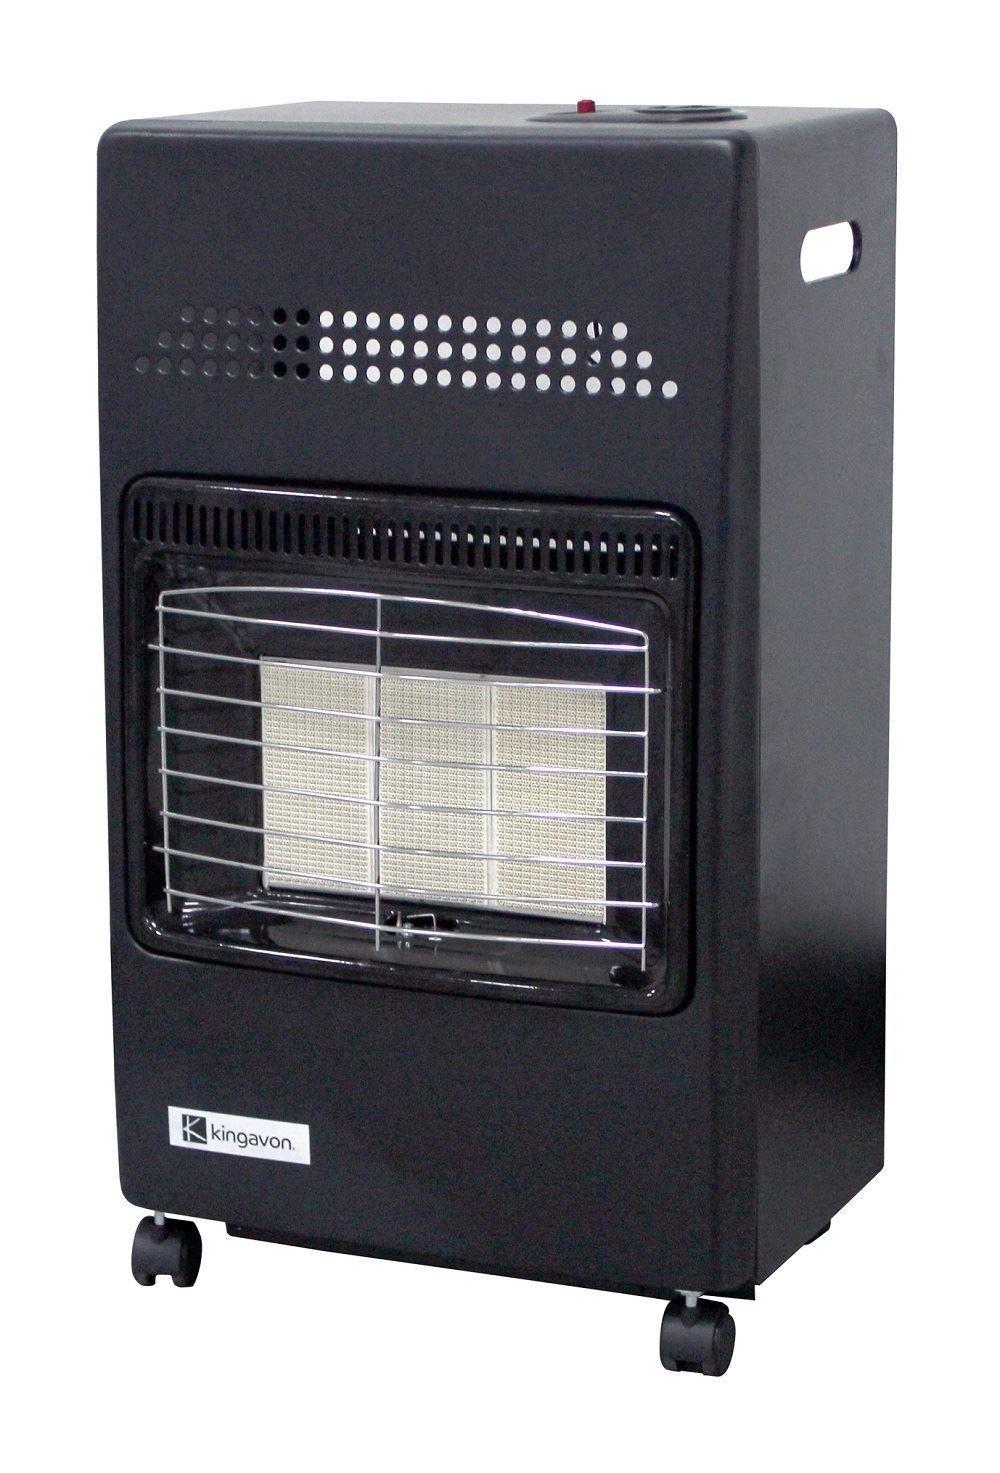 Kingavon Portable Gas Cabinet Heater 4 2kw Mcparlands